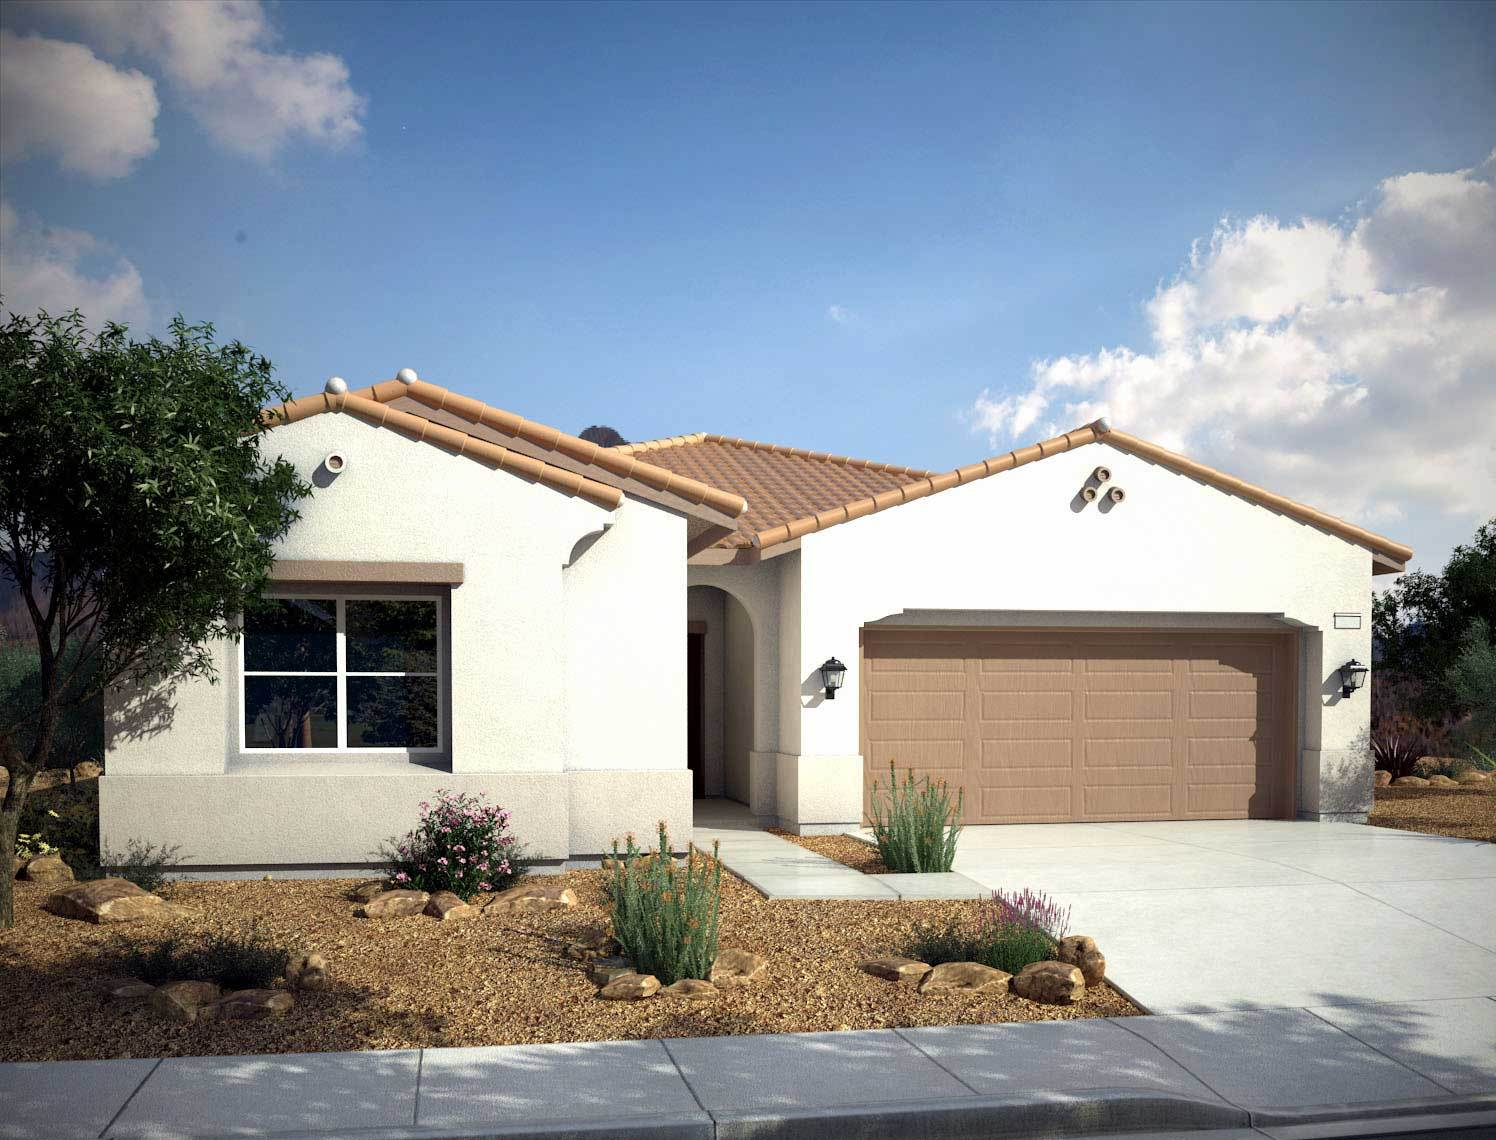 Single Family for Sale at Mountain Falls - Plan 3 - Series I - Villa Serena 5413 East Volterra Pahrump, Nevada 89061 United States